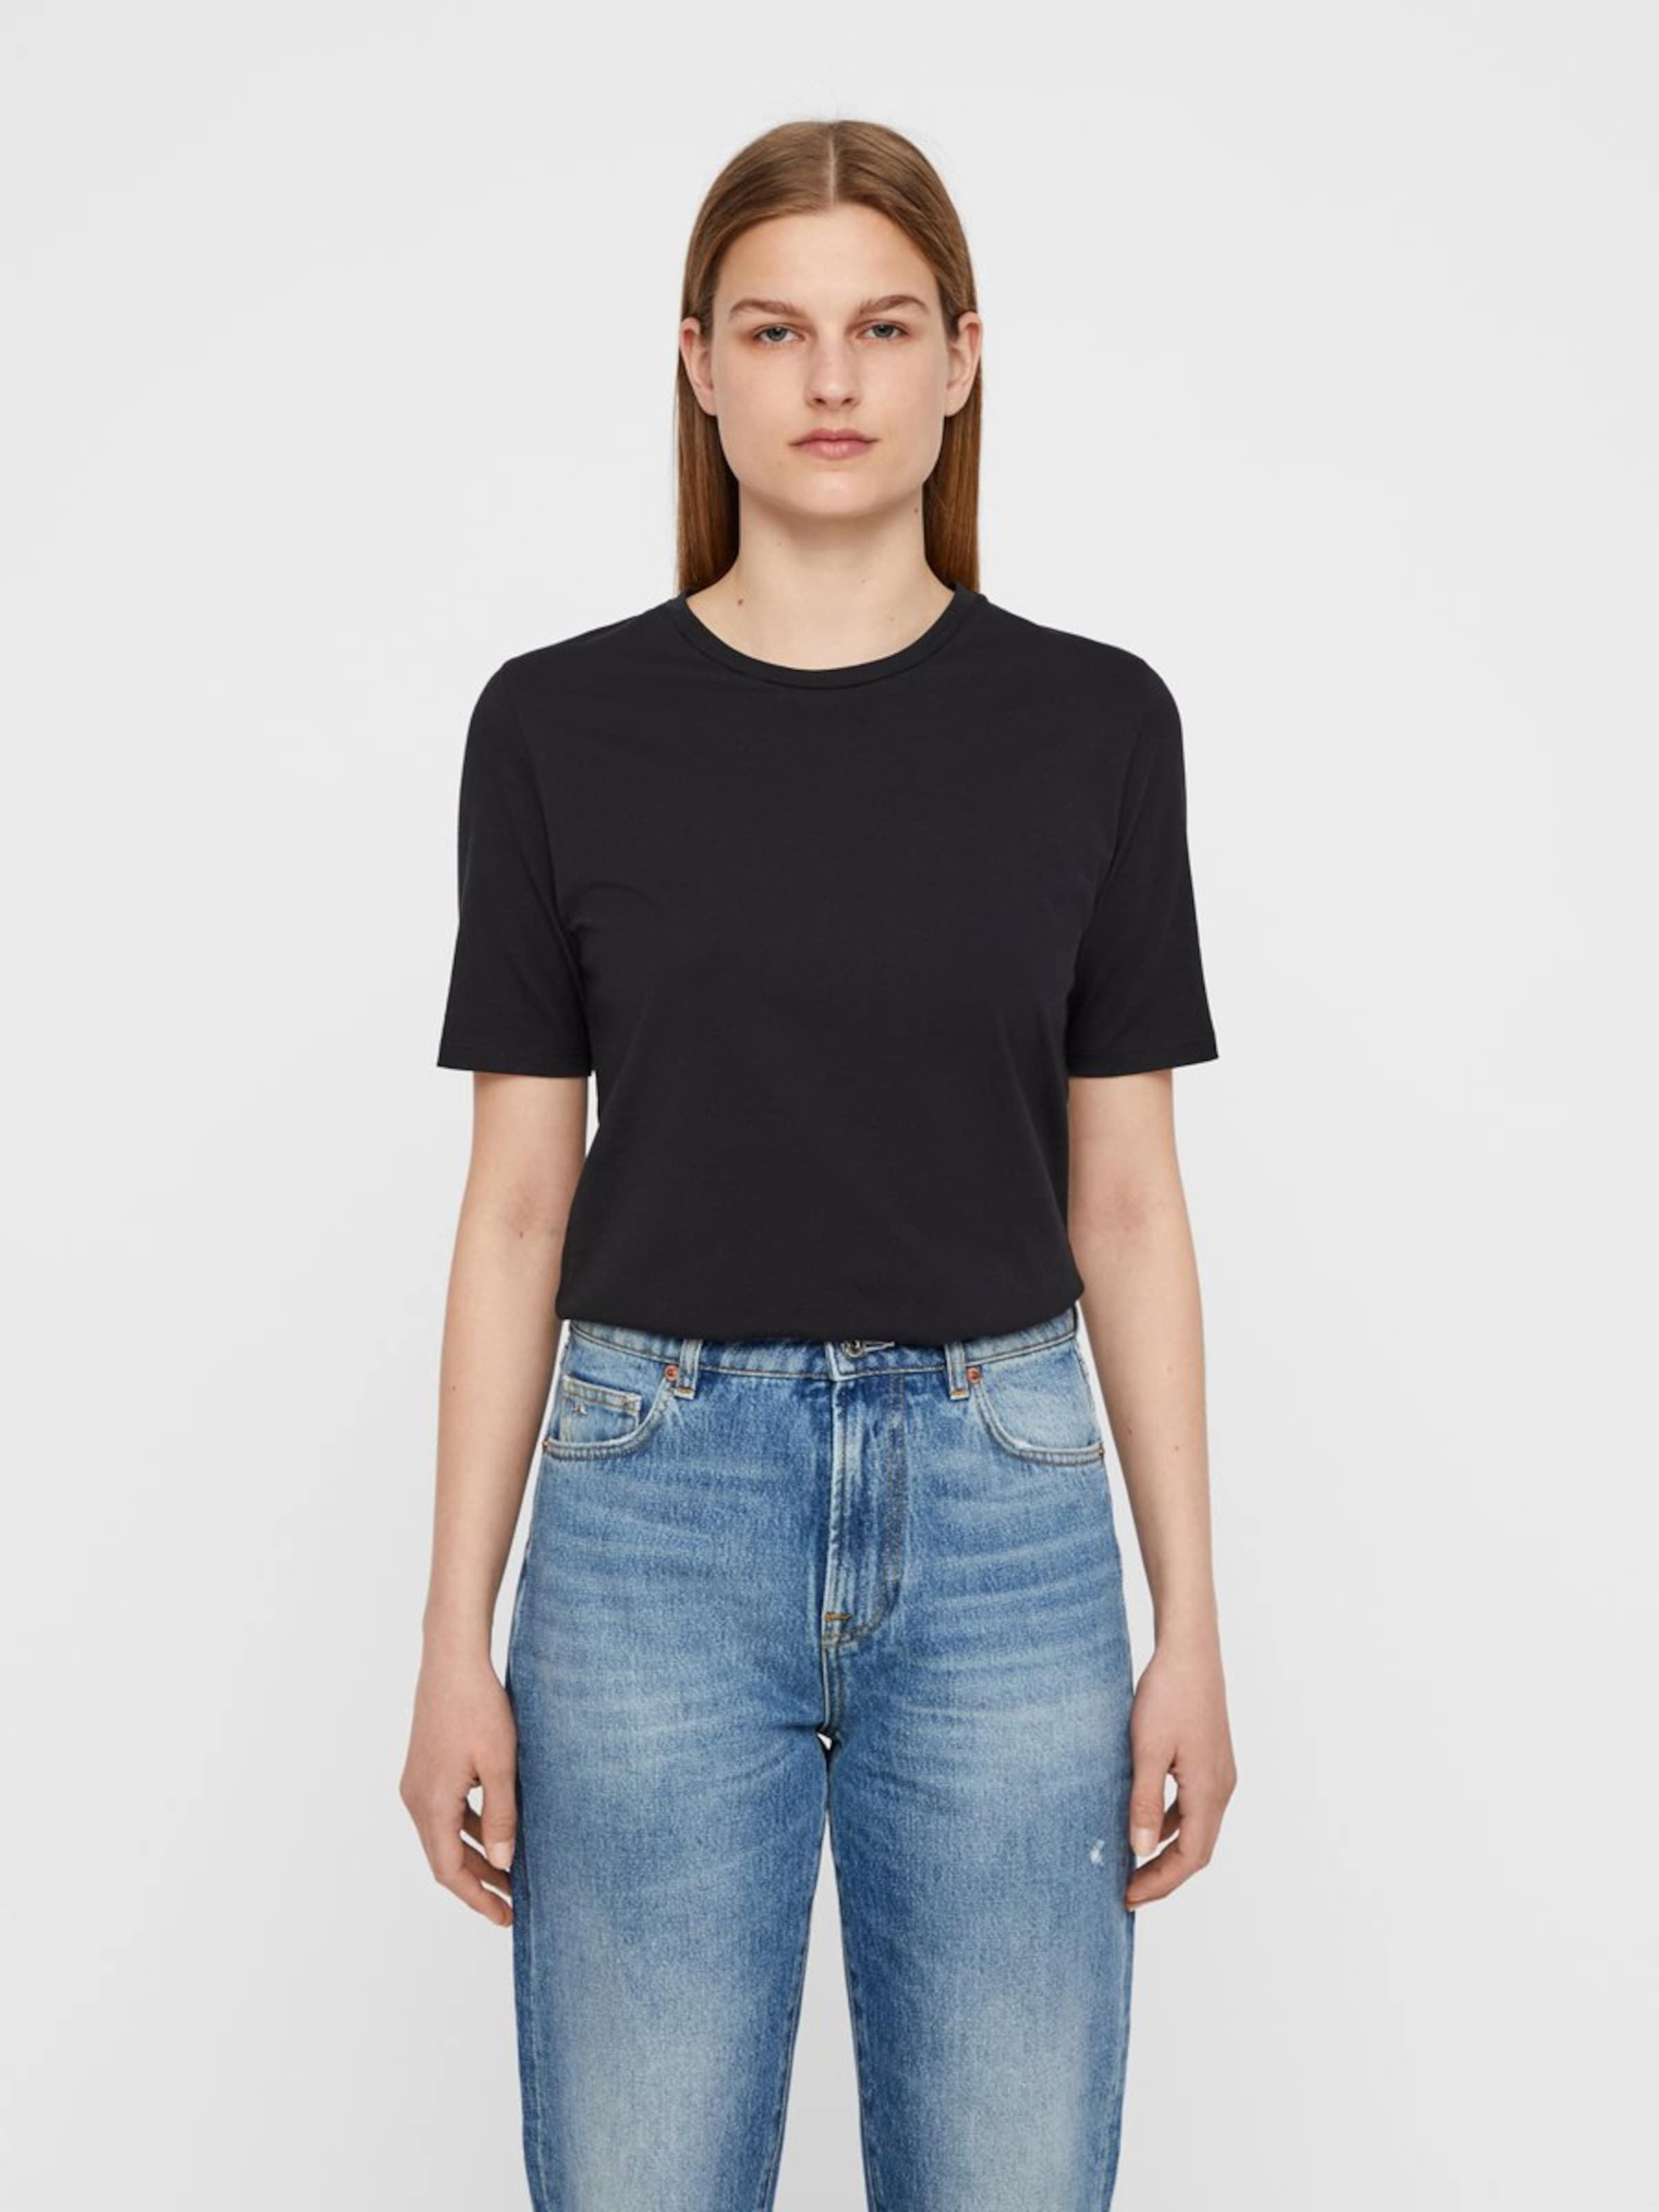 T In J Schwarz 'monique' lindeberg shirt I6vYf7bgy